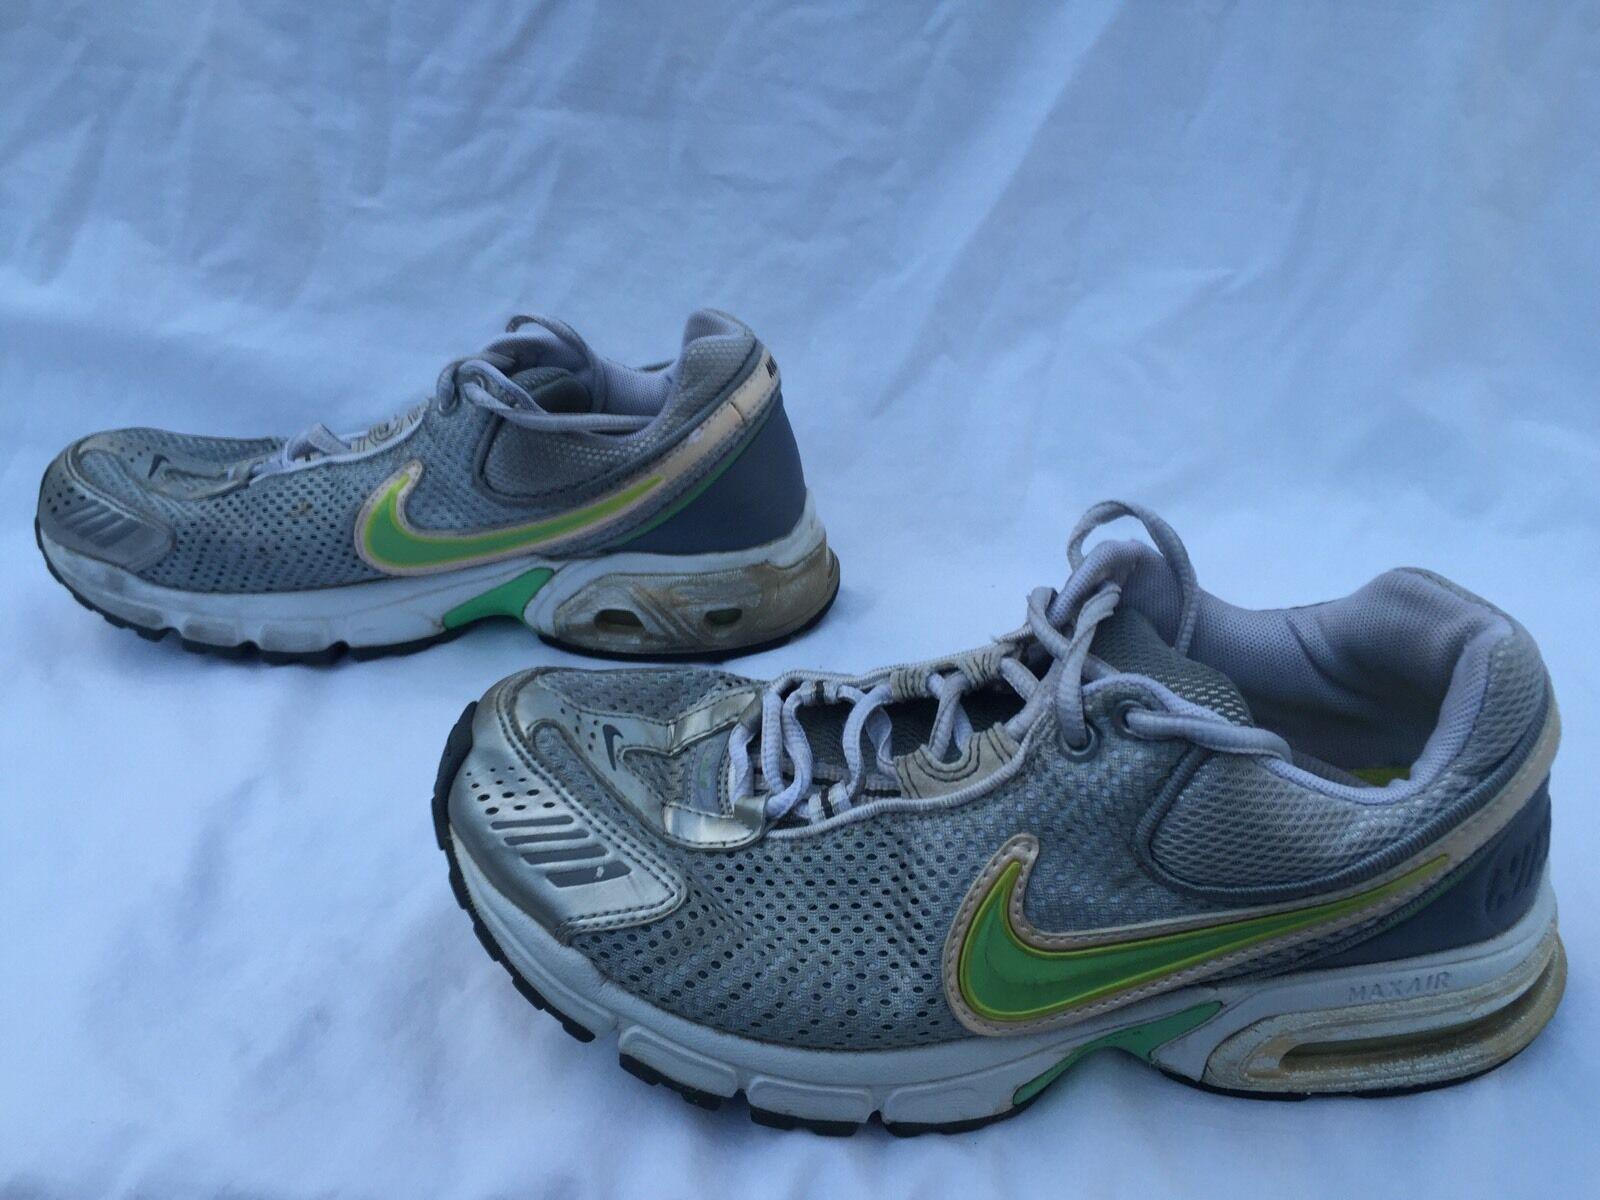 hot sale online dfa4a fd52d ... Nike Air Max 30-40 Women s Women s Women s Running Shoes Size US 9.5  White 313086 ...